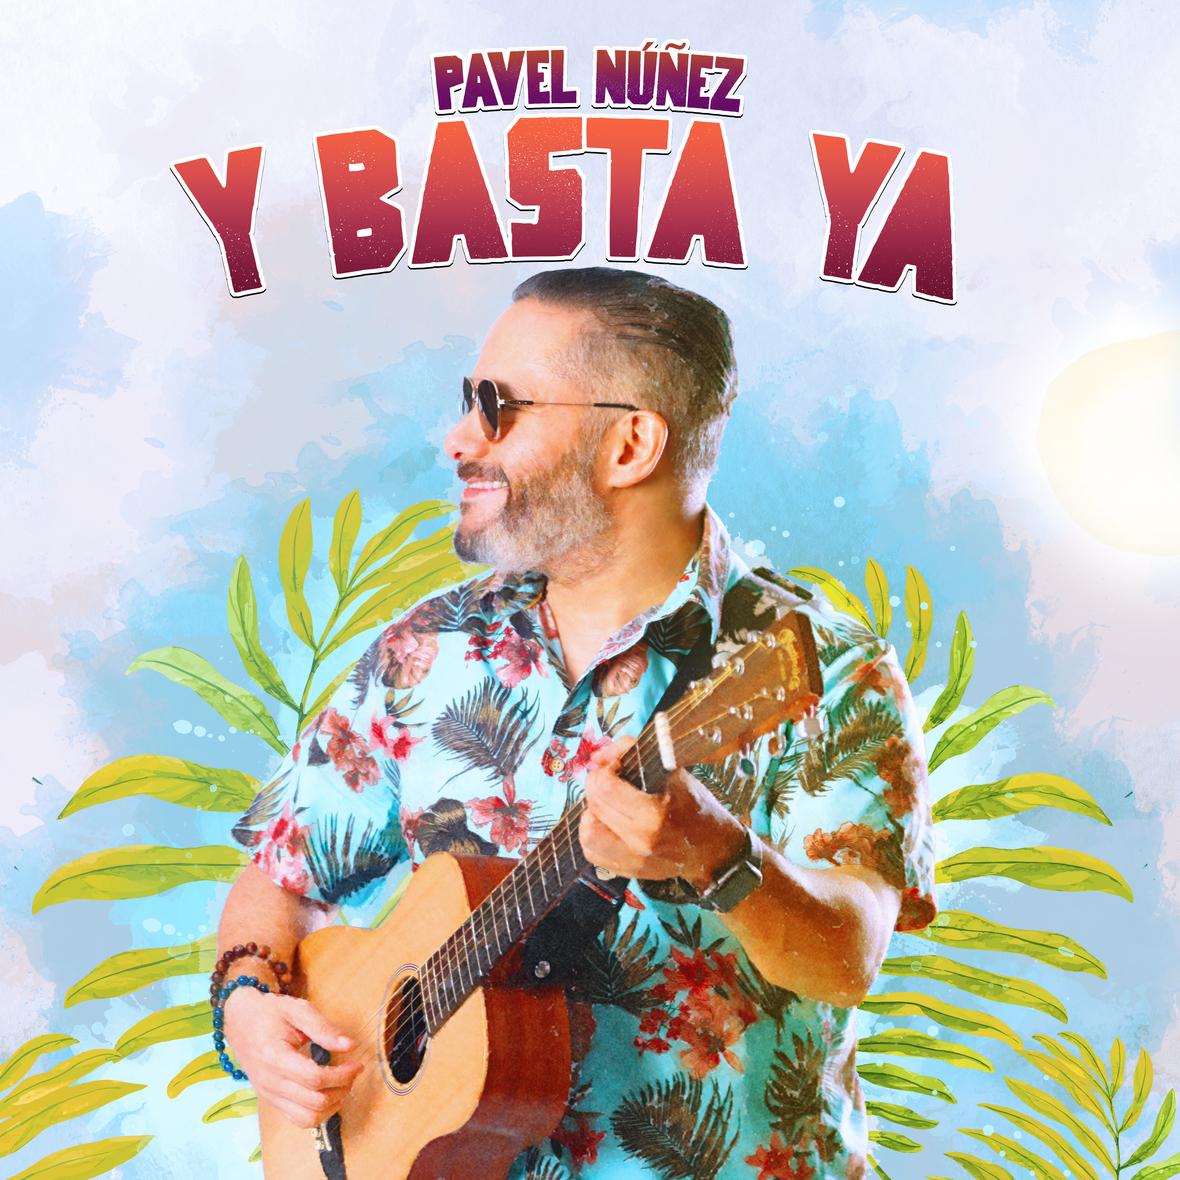 PAVEL NUNEZ - Y Basta Ya